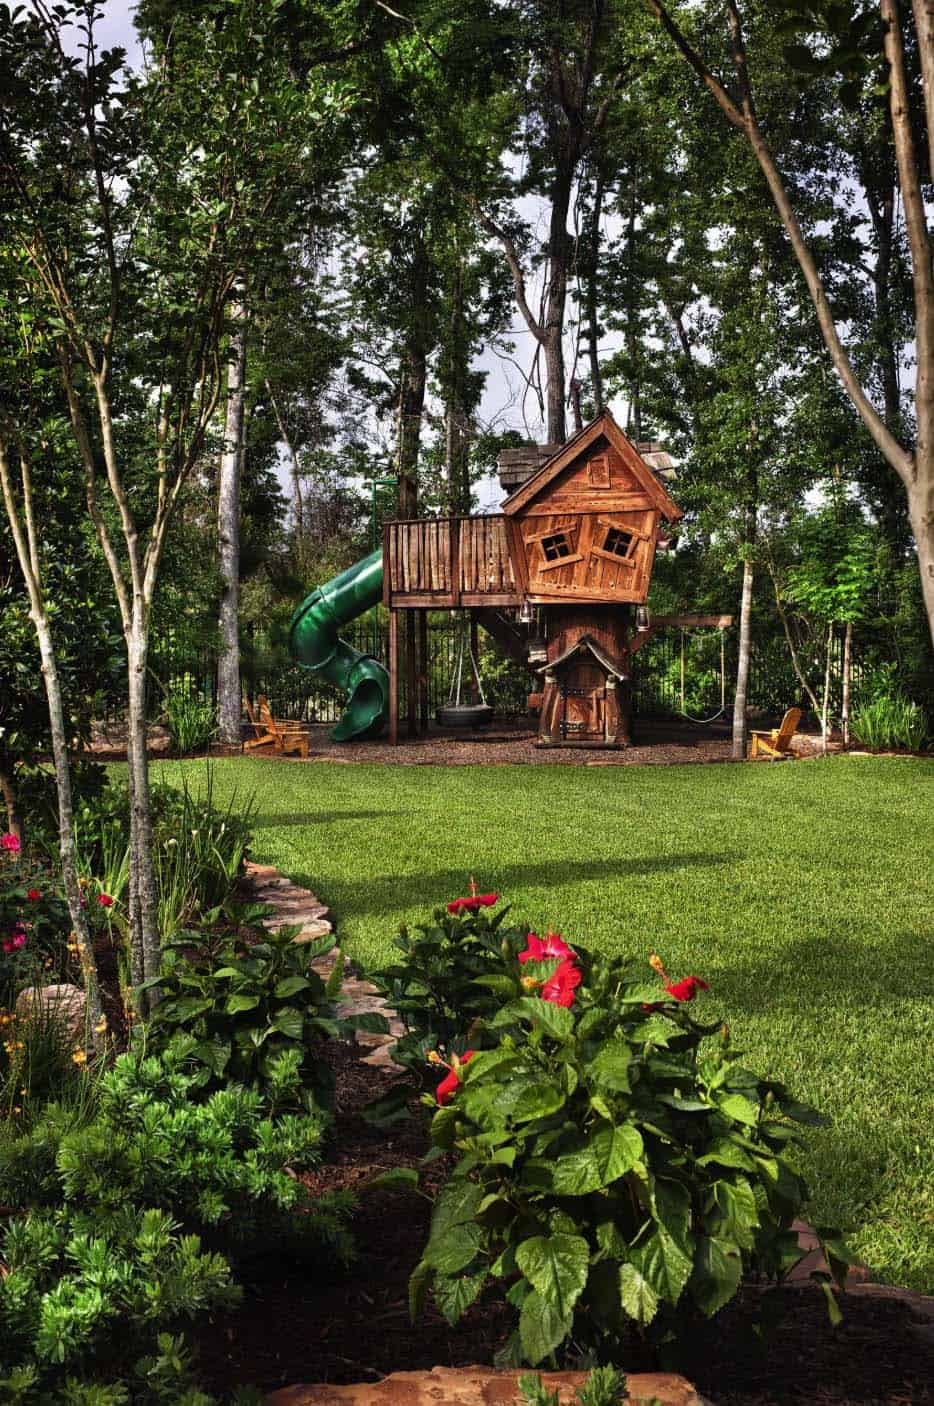 manoir-anglais-paysage-traditionnel-kids-playhouse